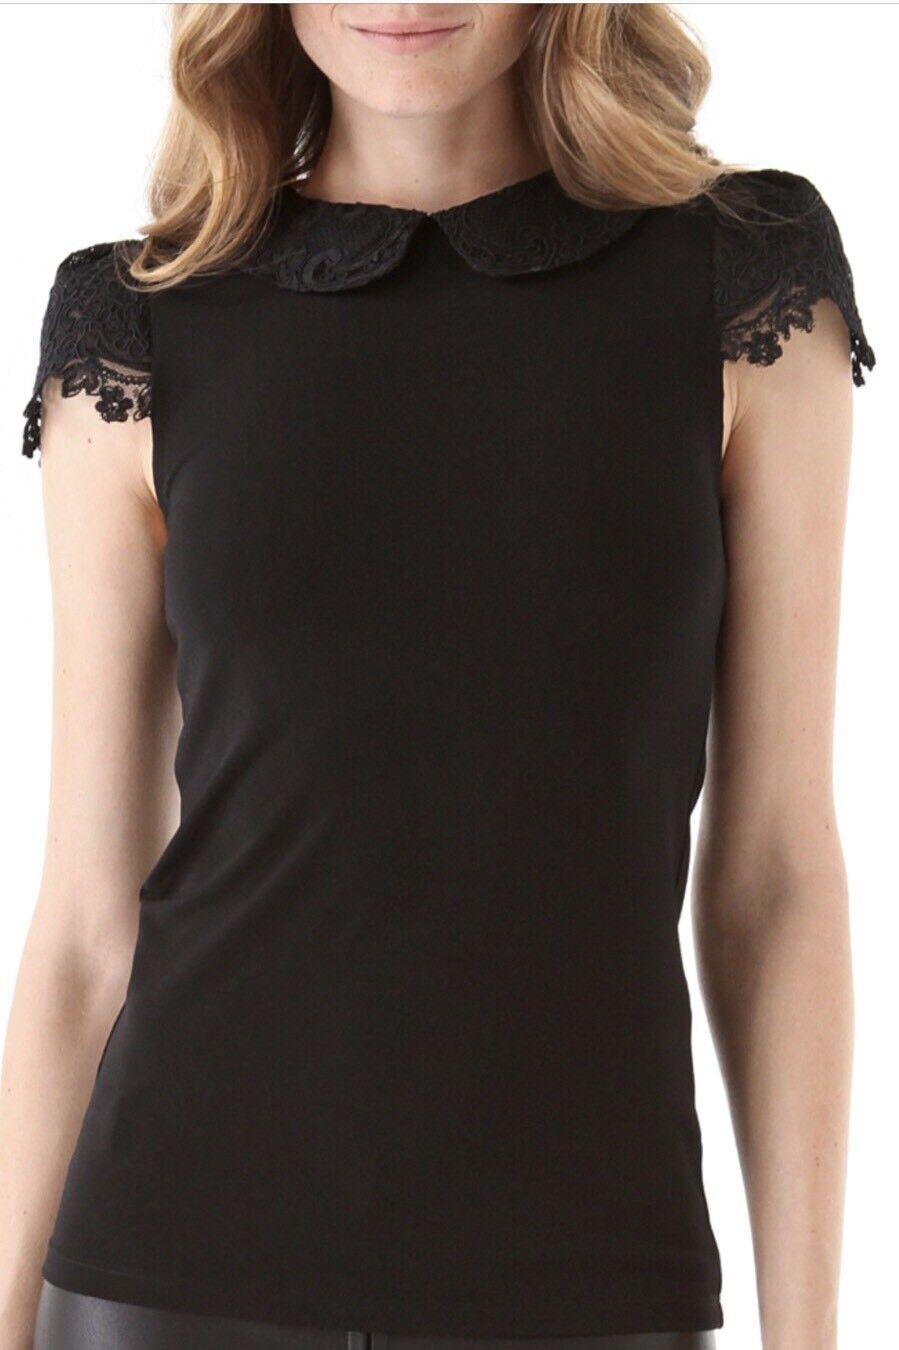 Alice + Olivia Luiza Lace Peter Pan Collar Cap Sleeve Top schwarz Größe S NWOT